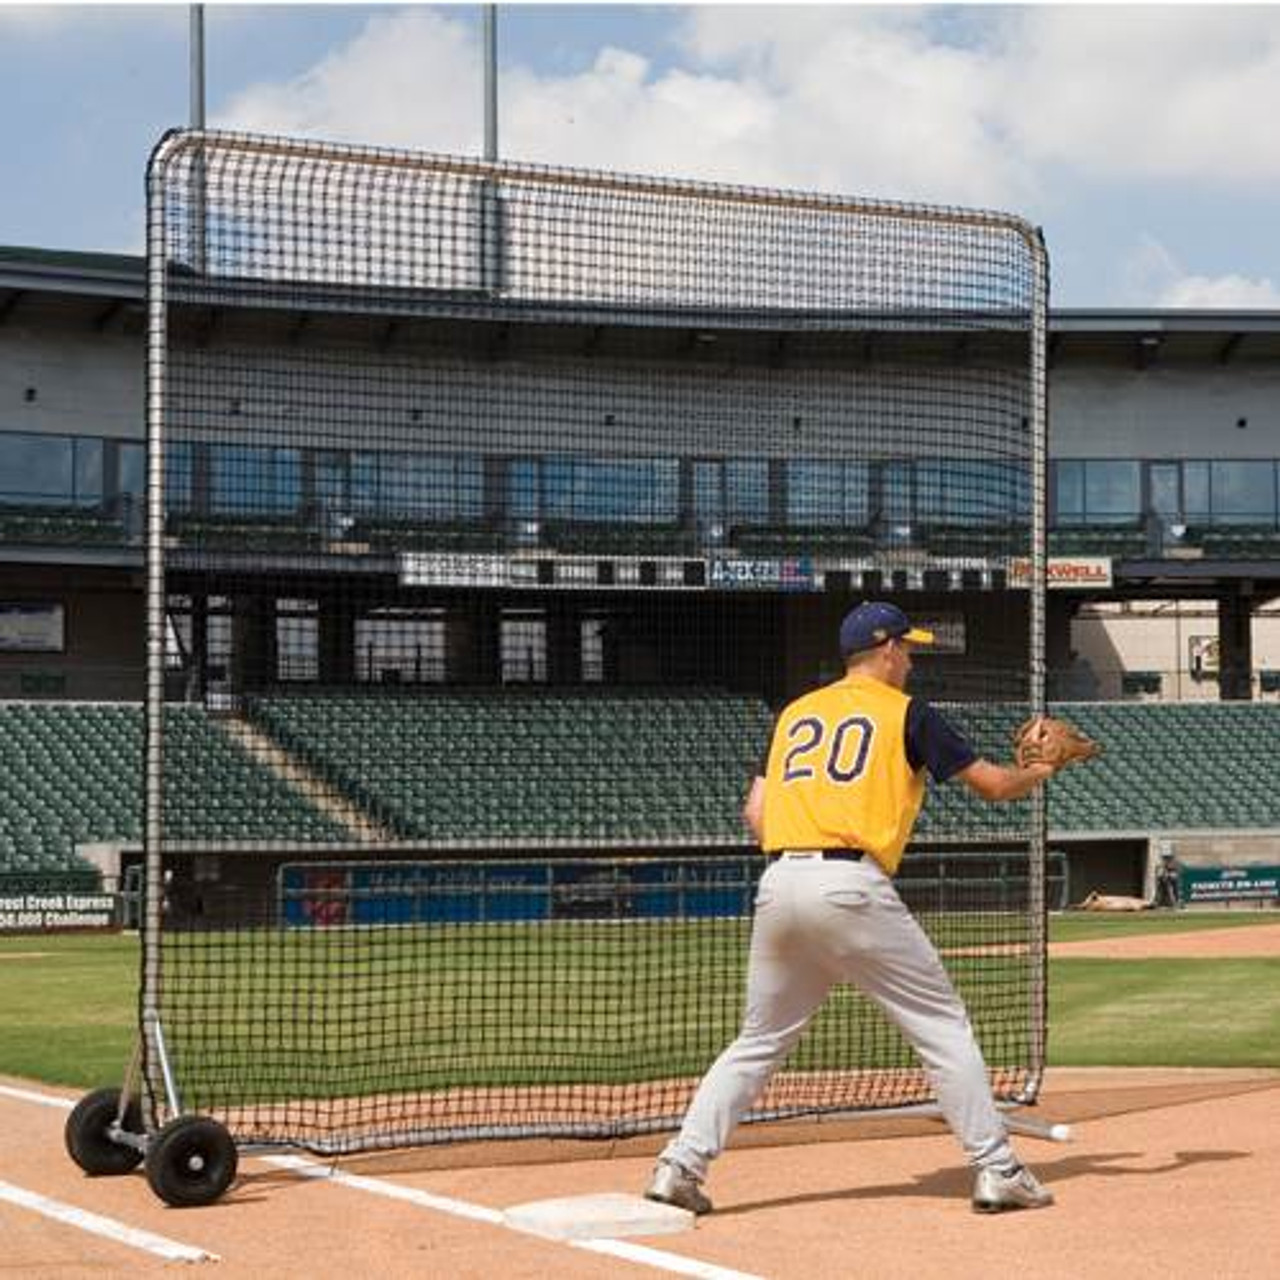 Baseball Protector Pro Base Fungo Screen 8' x 8'